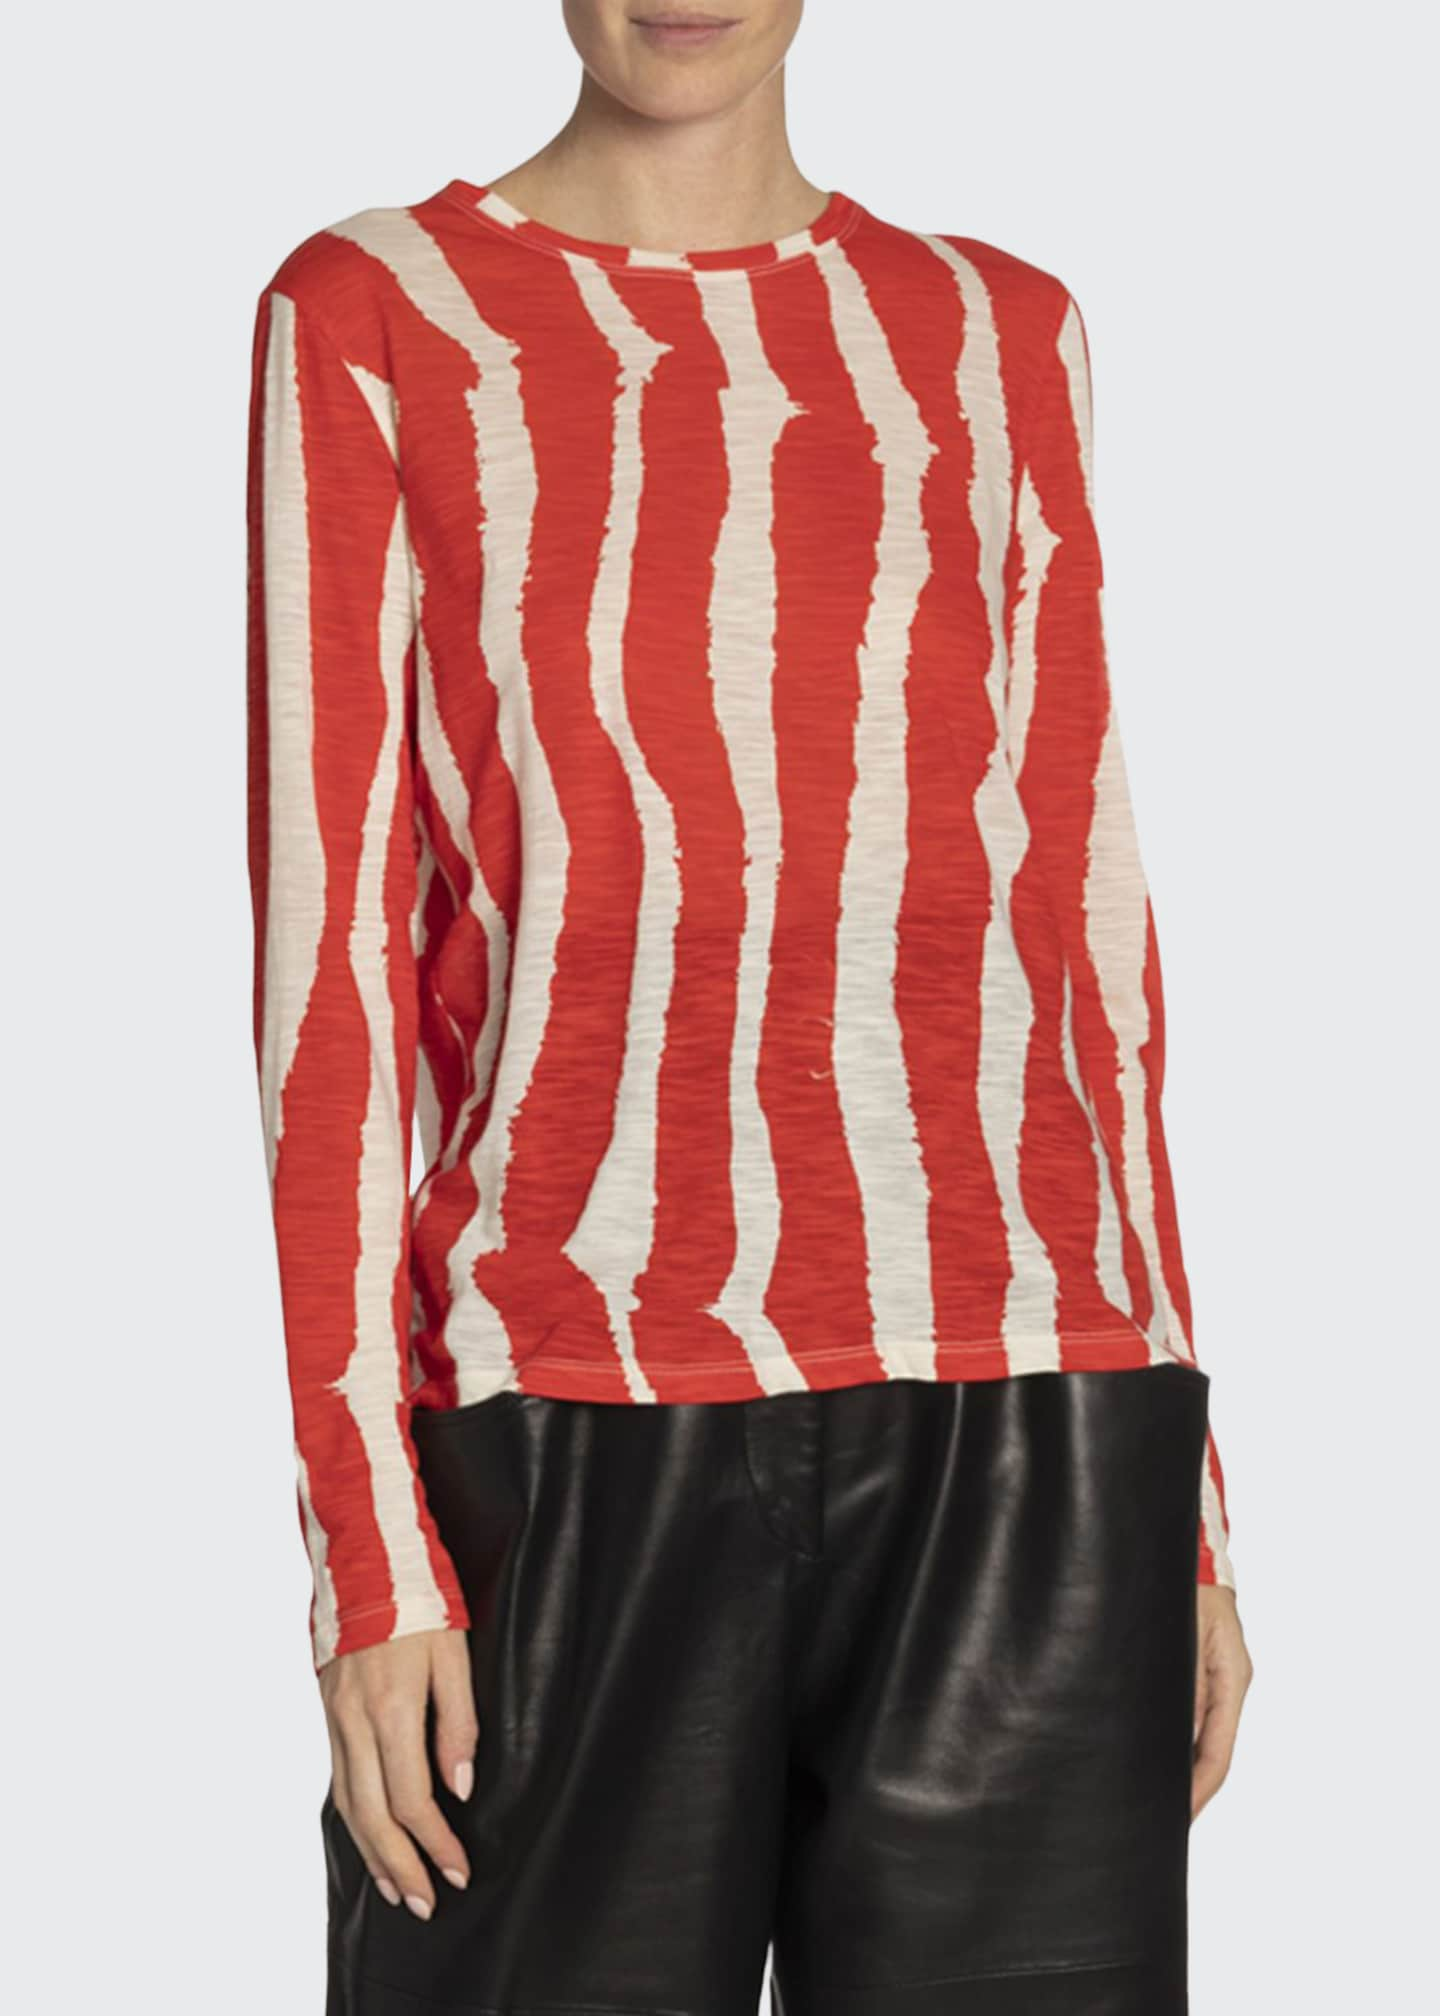 Proenza Schouler Zebra Striped Long-Sleeve Tee